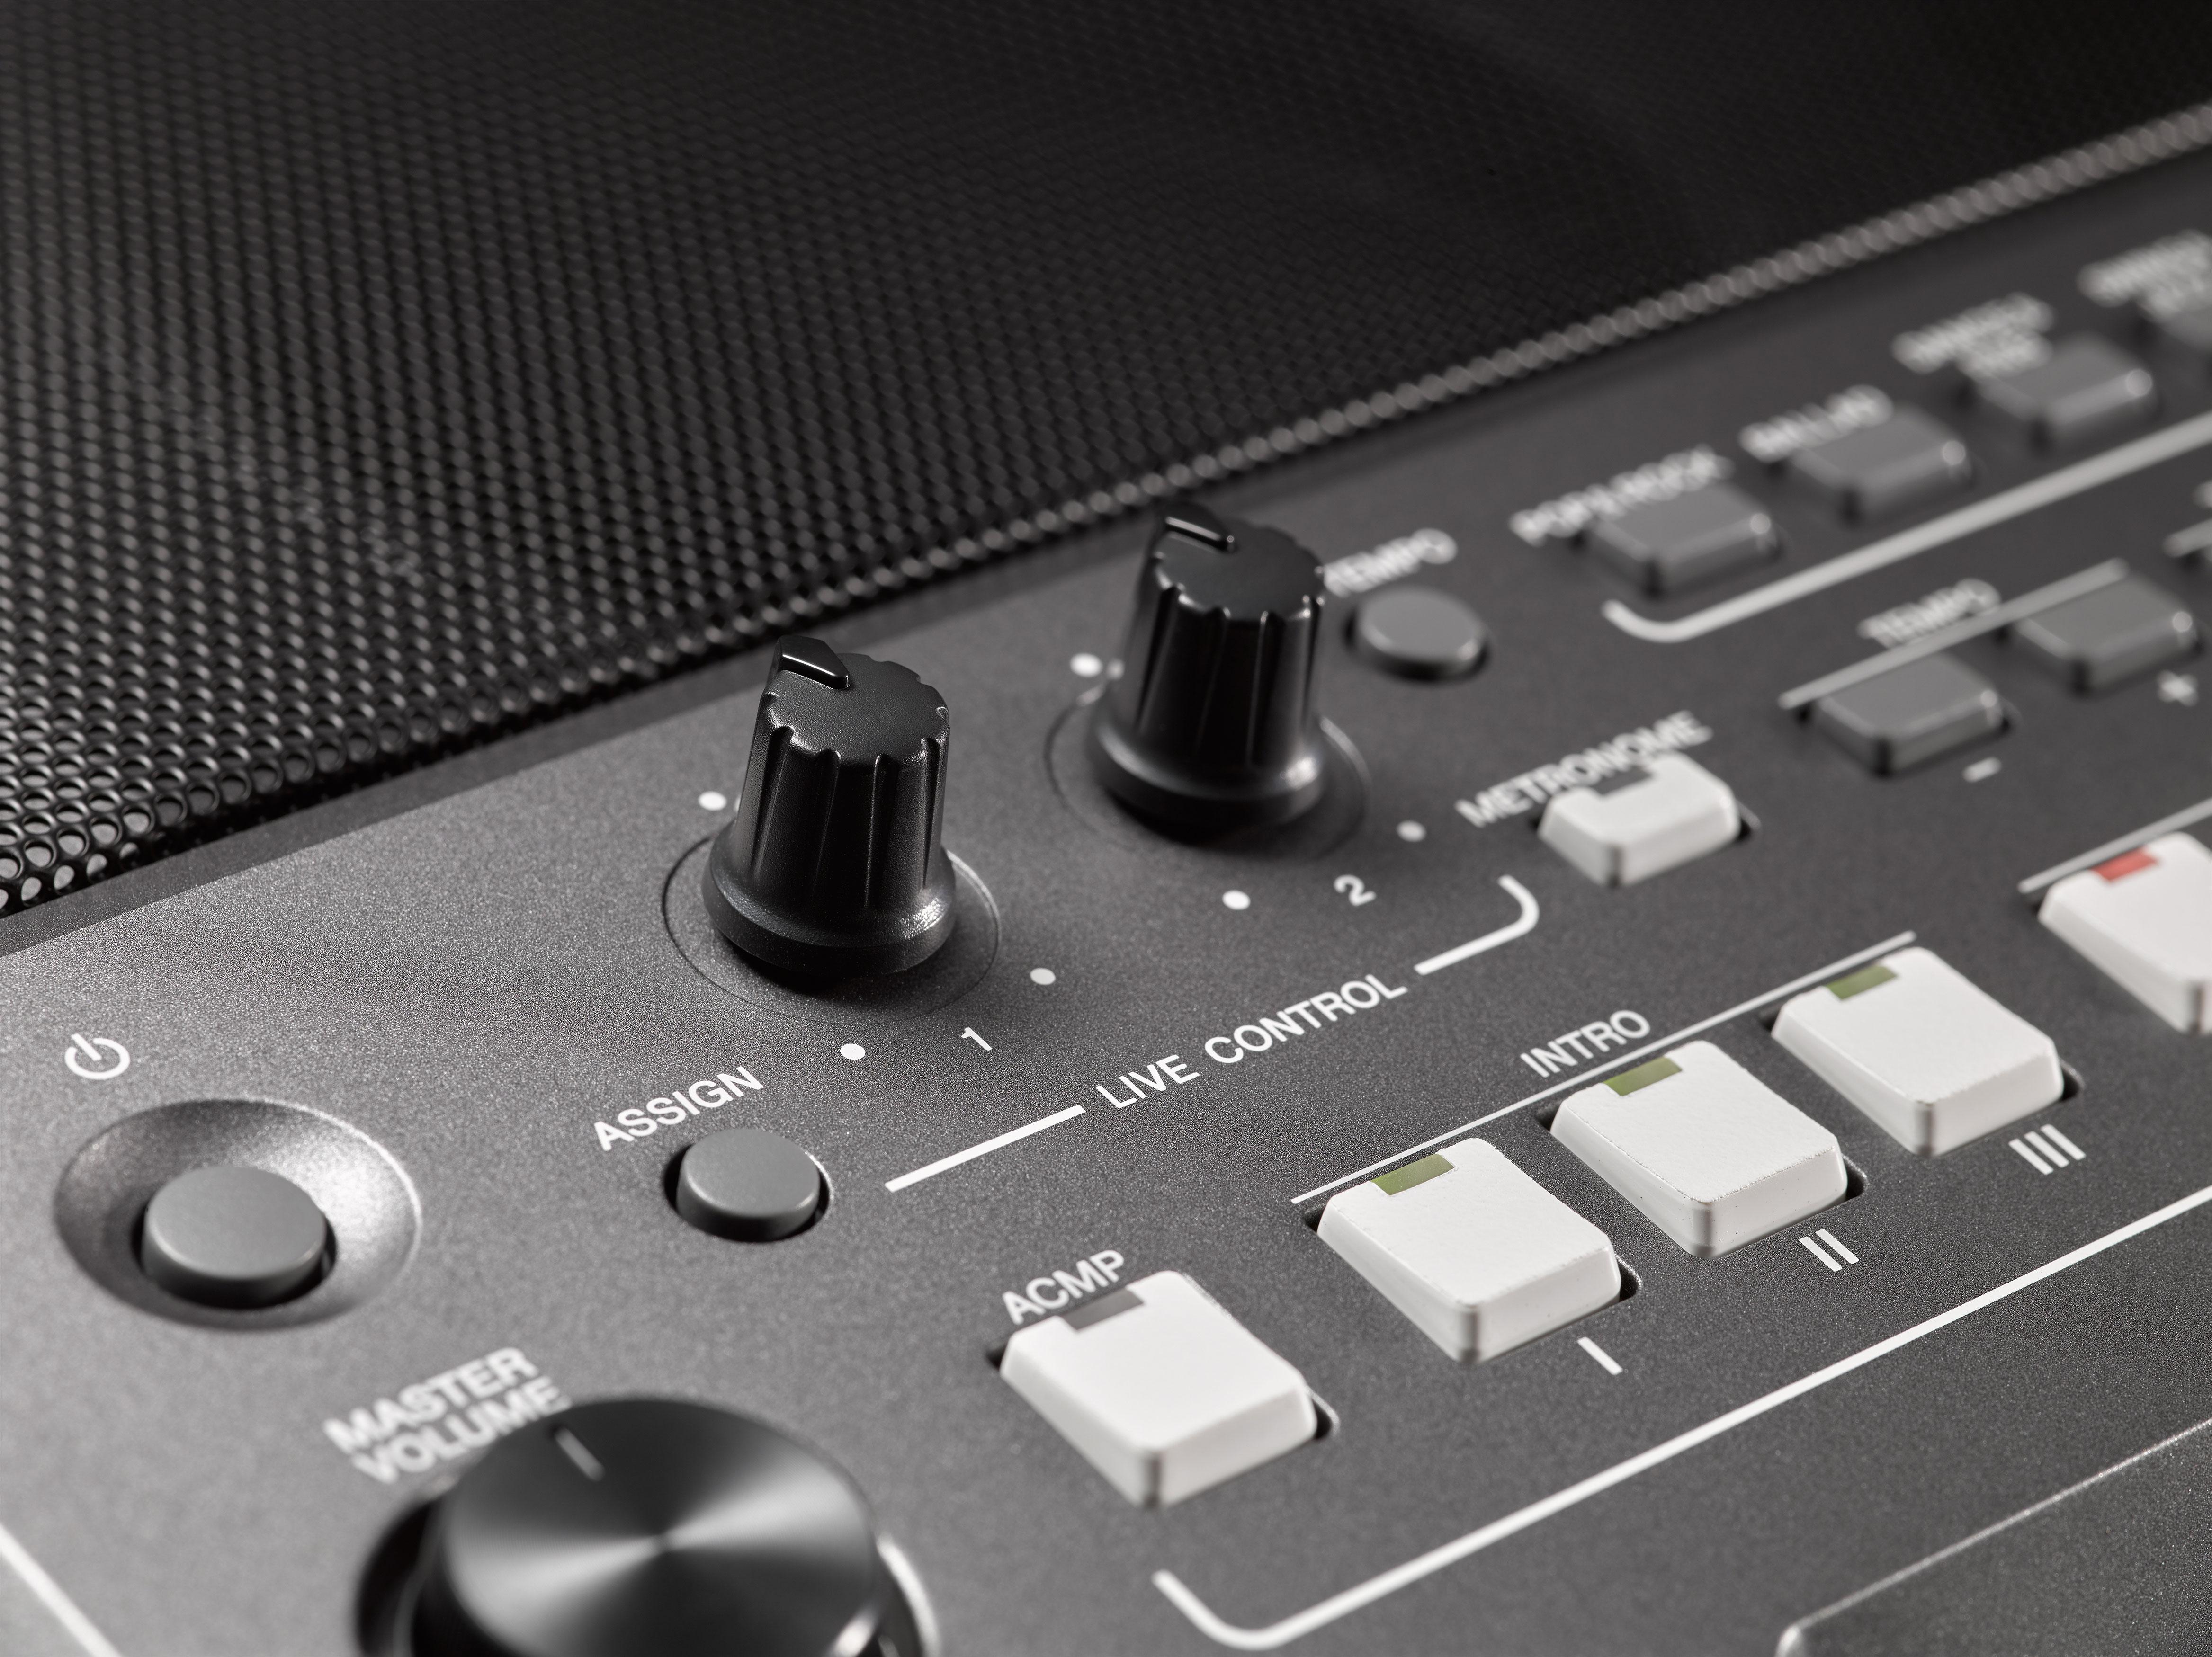 New Yamaha PSR-S670, PSR-S770 and PSR-S970 arranger